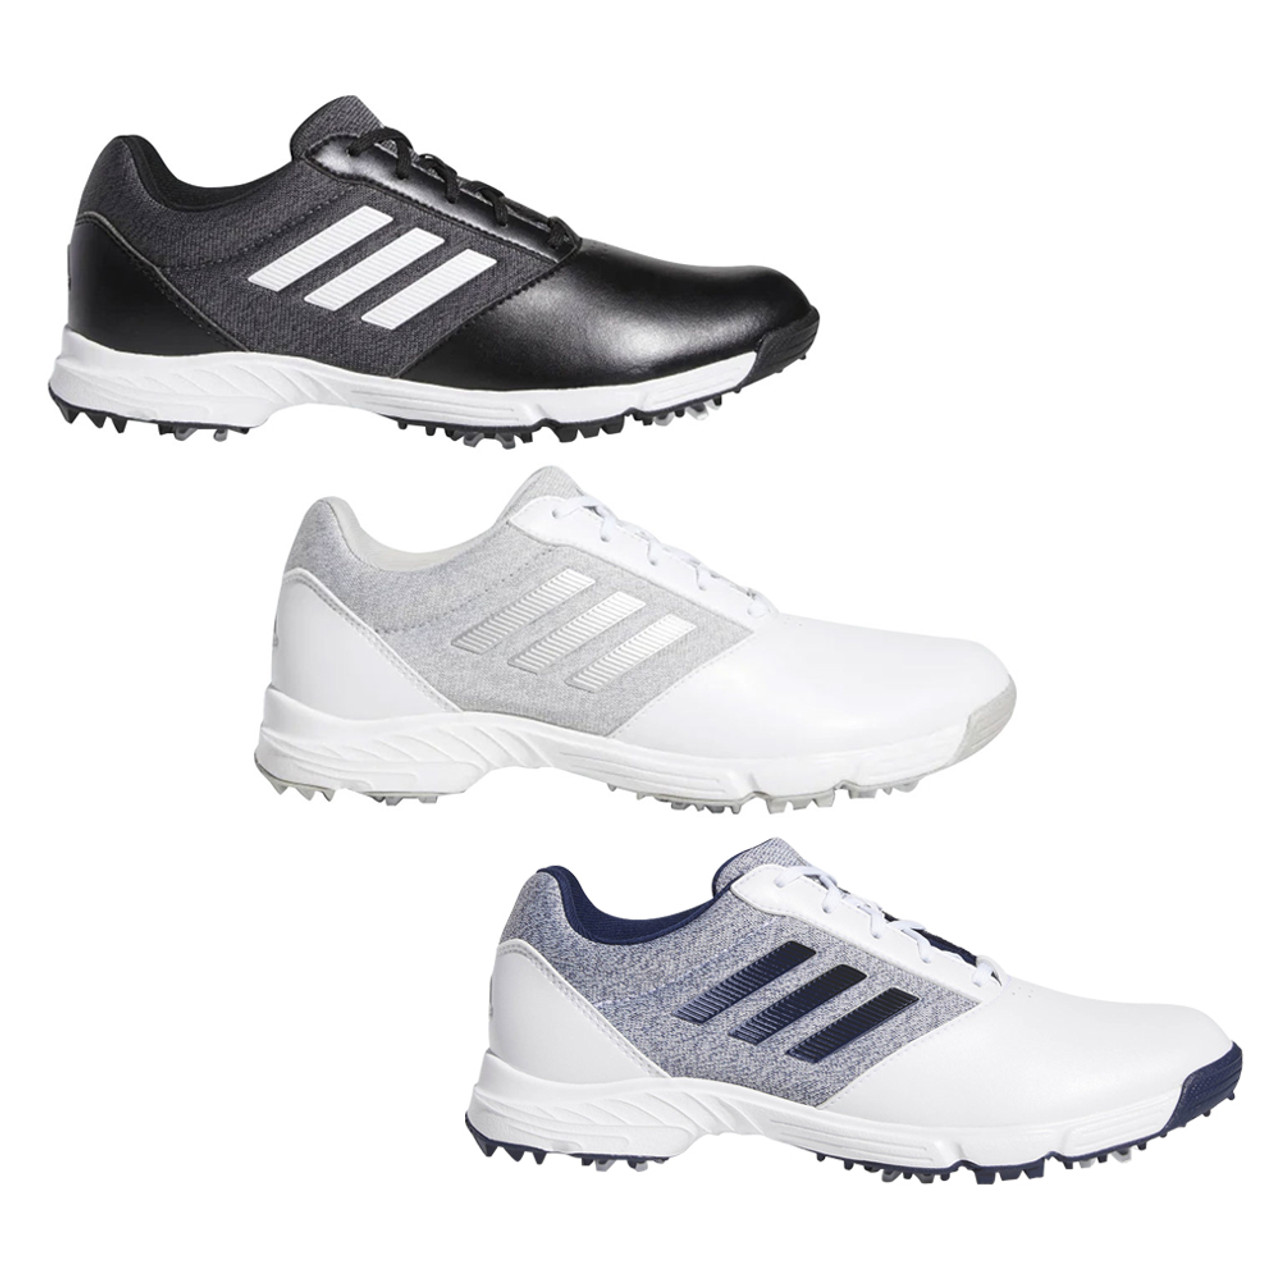 Adidas Tech Response Golf Shoes 2019 Women Golfio